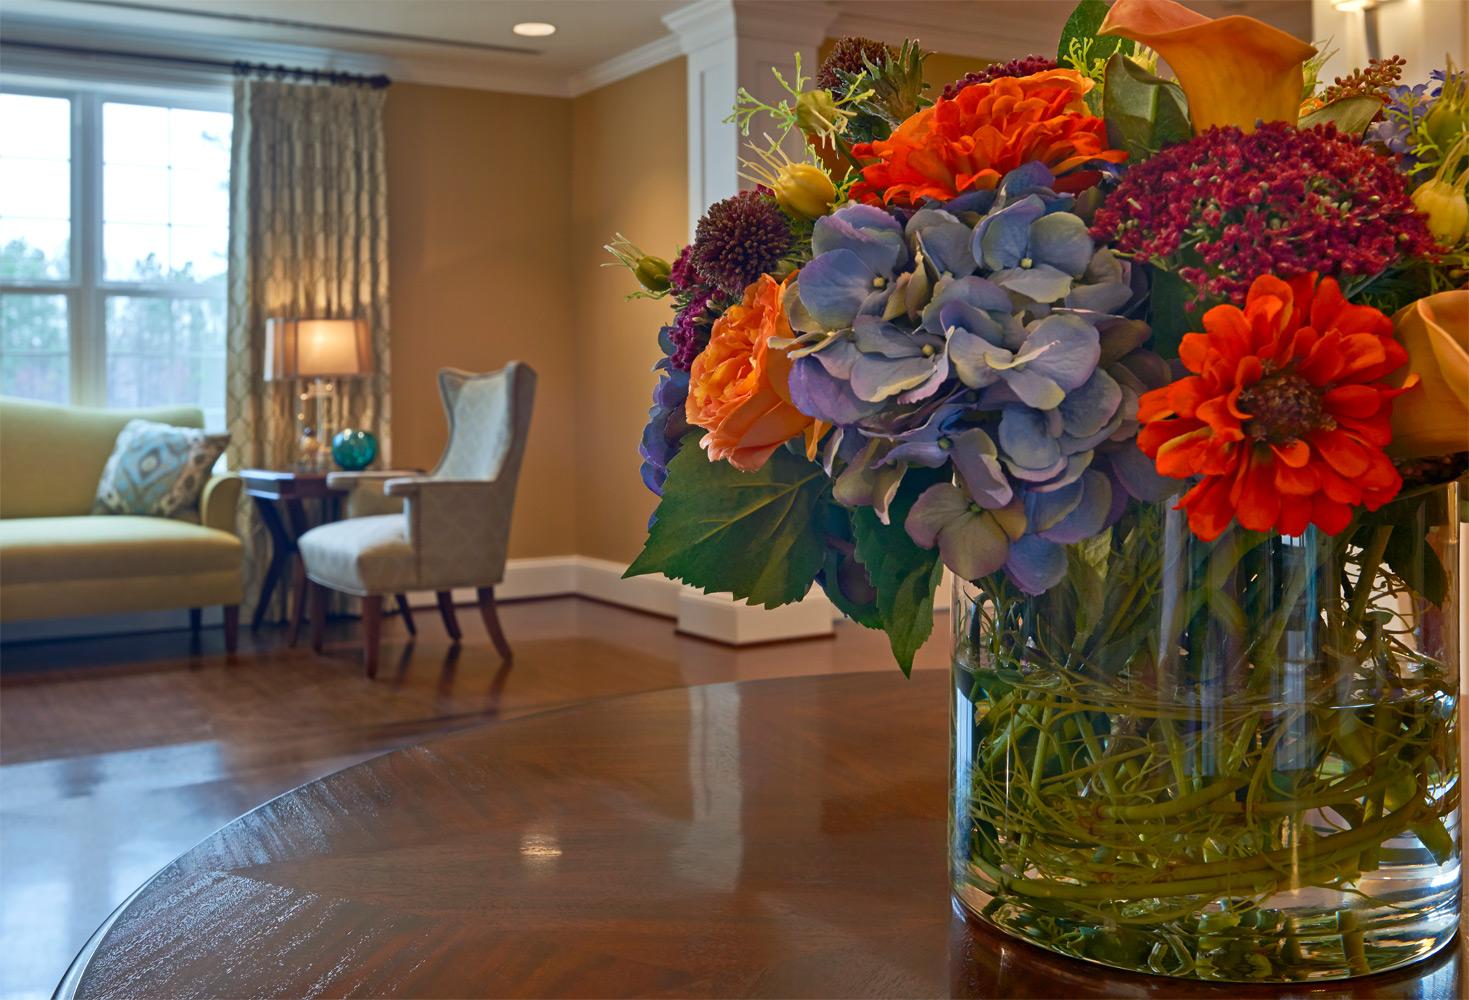 Brandermill Woods Skilled Care Flower Vase Image